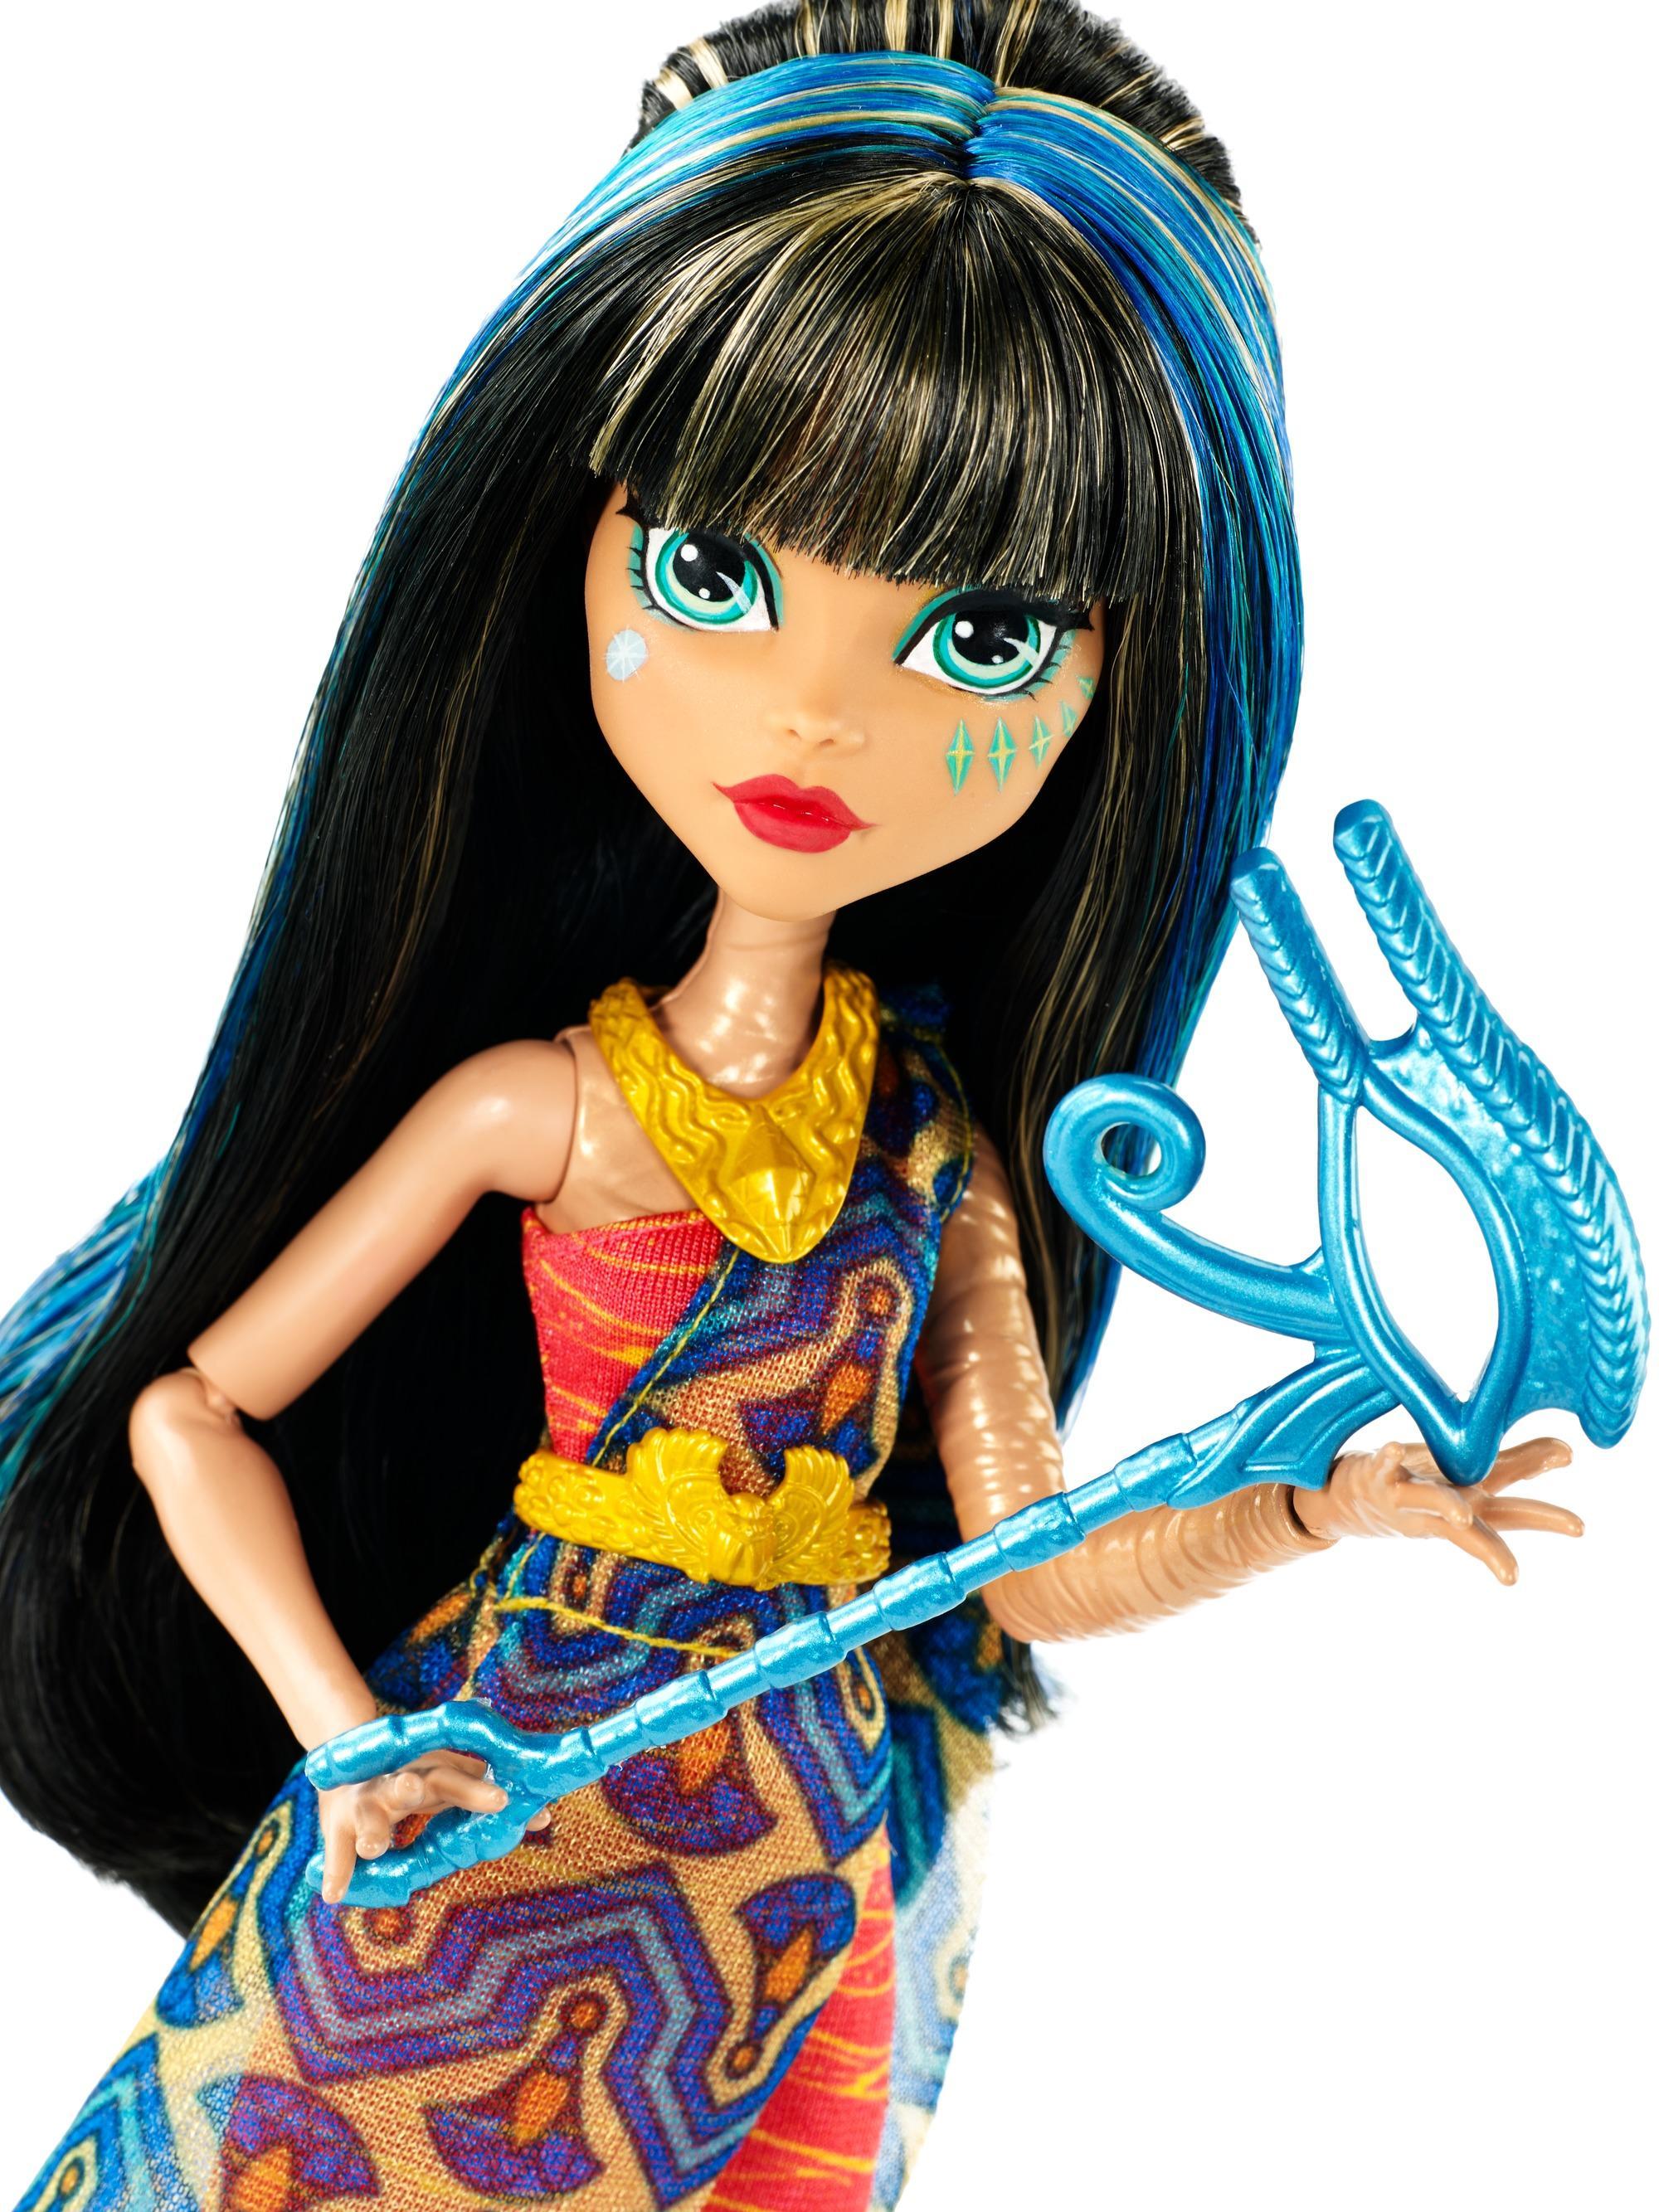 Worksheet. Amazoncom Monster High Dance The Fright Away Cleo De Nile Doll